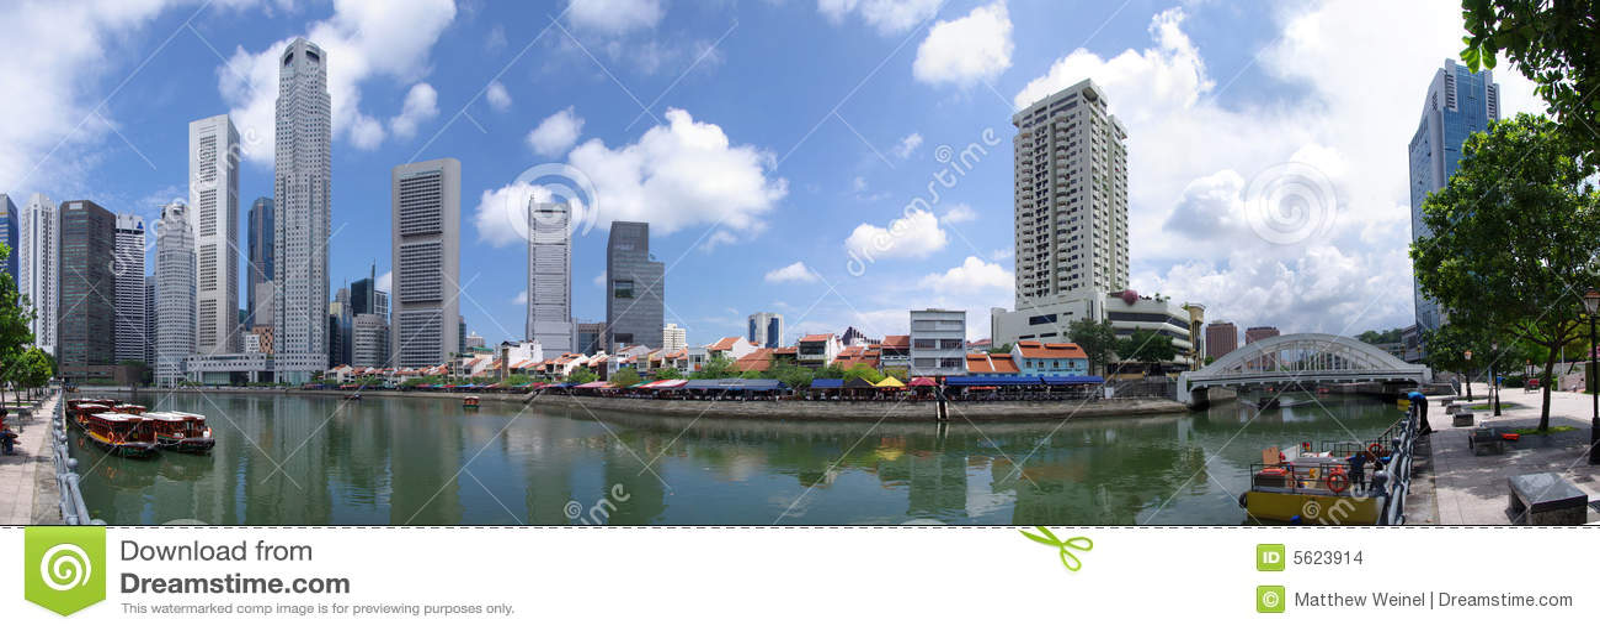 Download Singapore Skyline Raffles Quay Stock Photo - Image of colorful, dock: 5623914